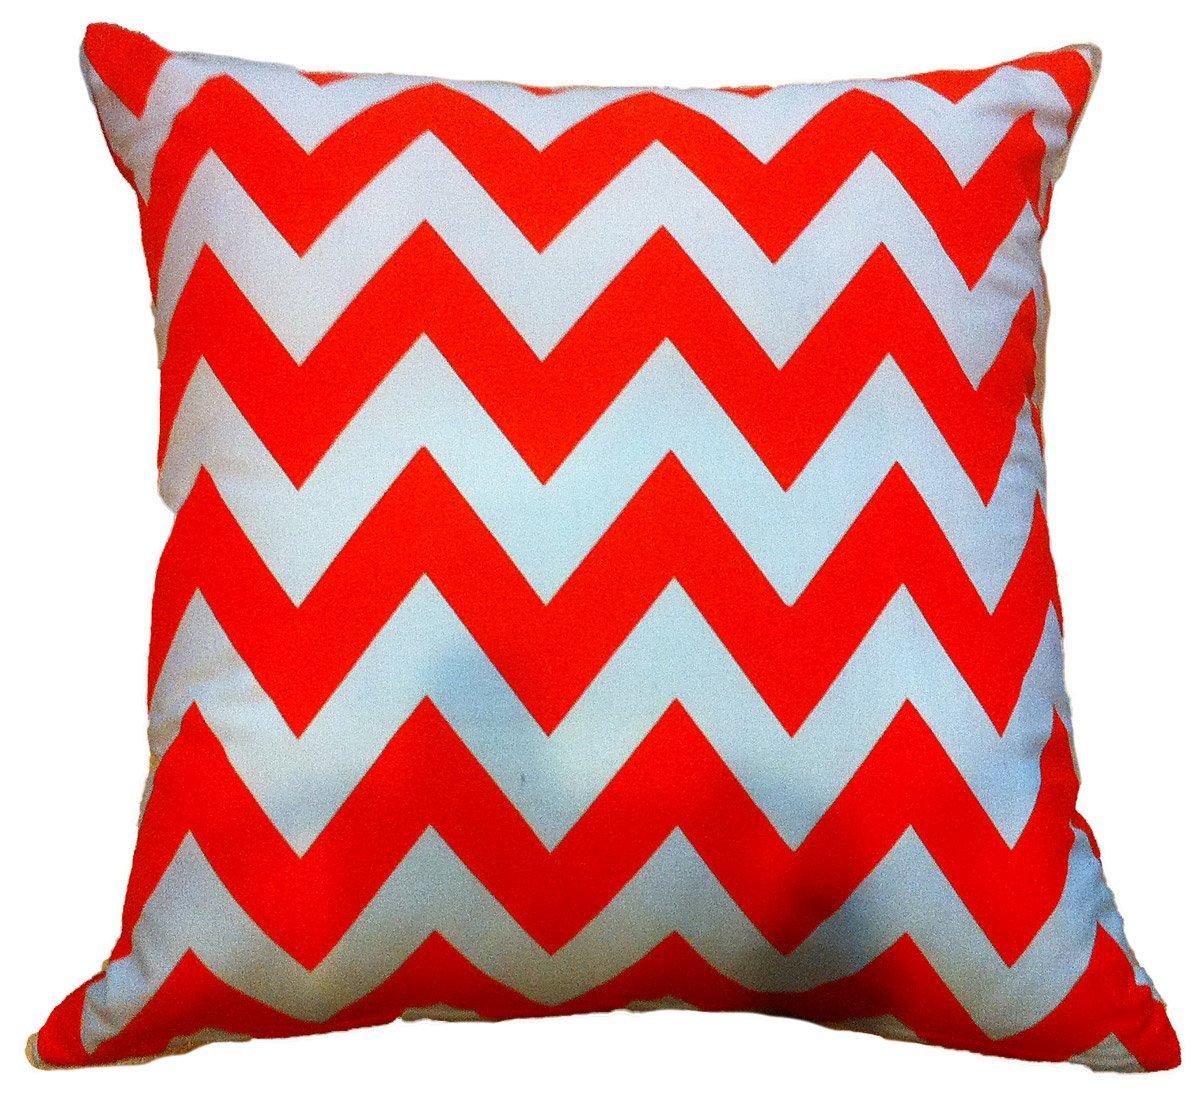 "Artiwa Contemporary Zig Zag Orange and White 18""x18"" Canvas Cotton Sofa Bed Throw Decorative Pillow Case, Gift Idea"